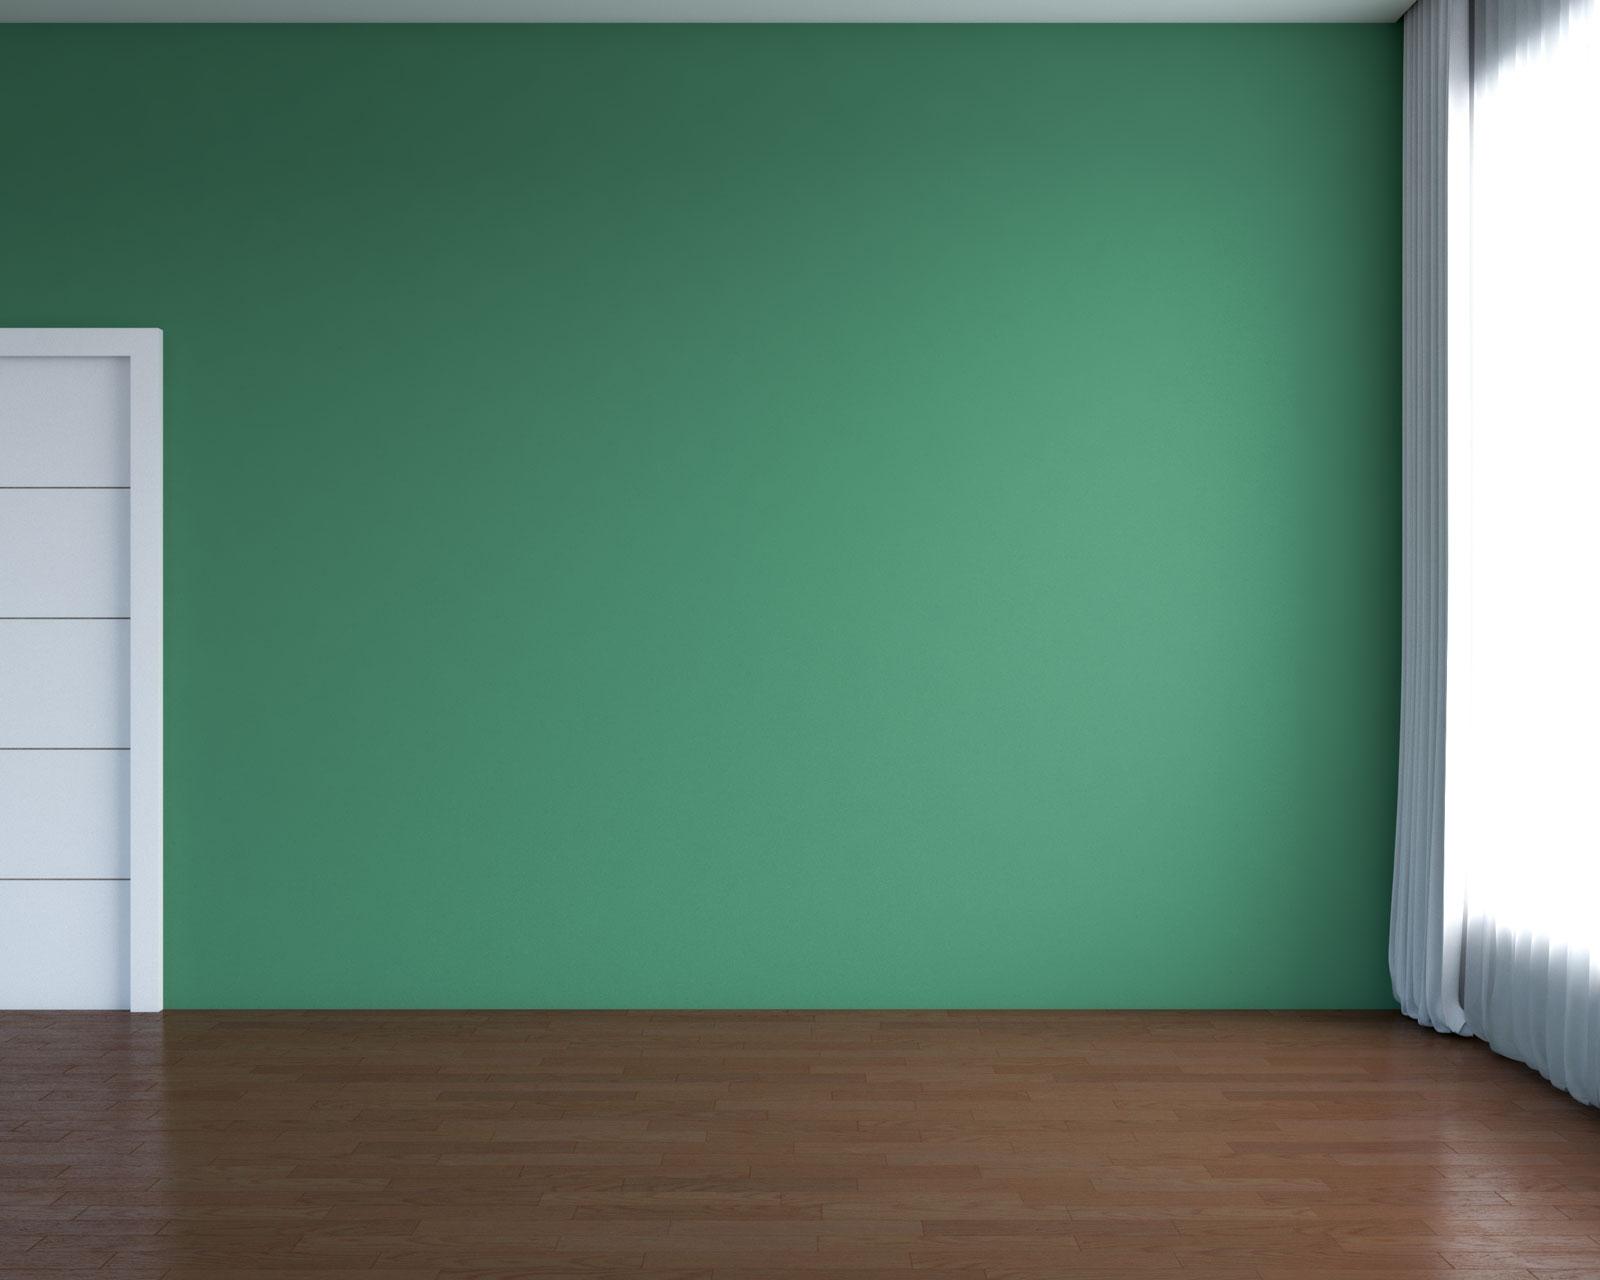 Brown hardwood flooring with green walls